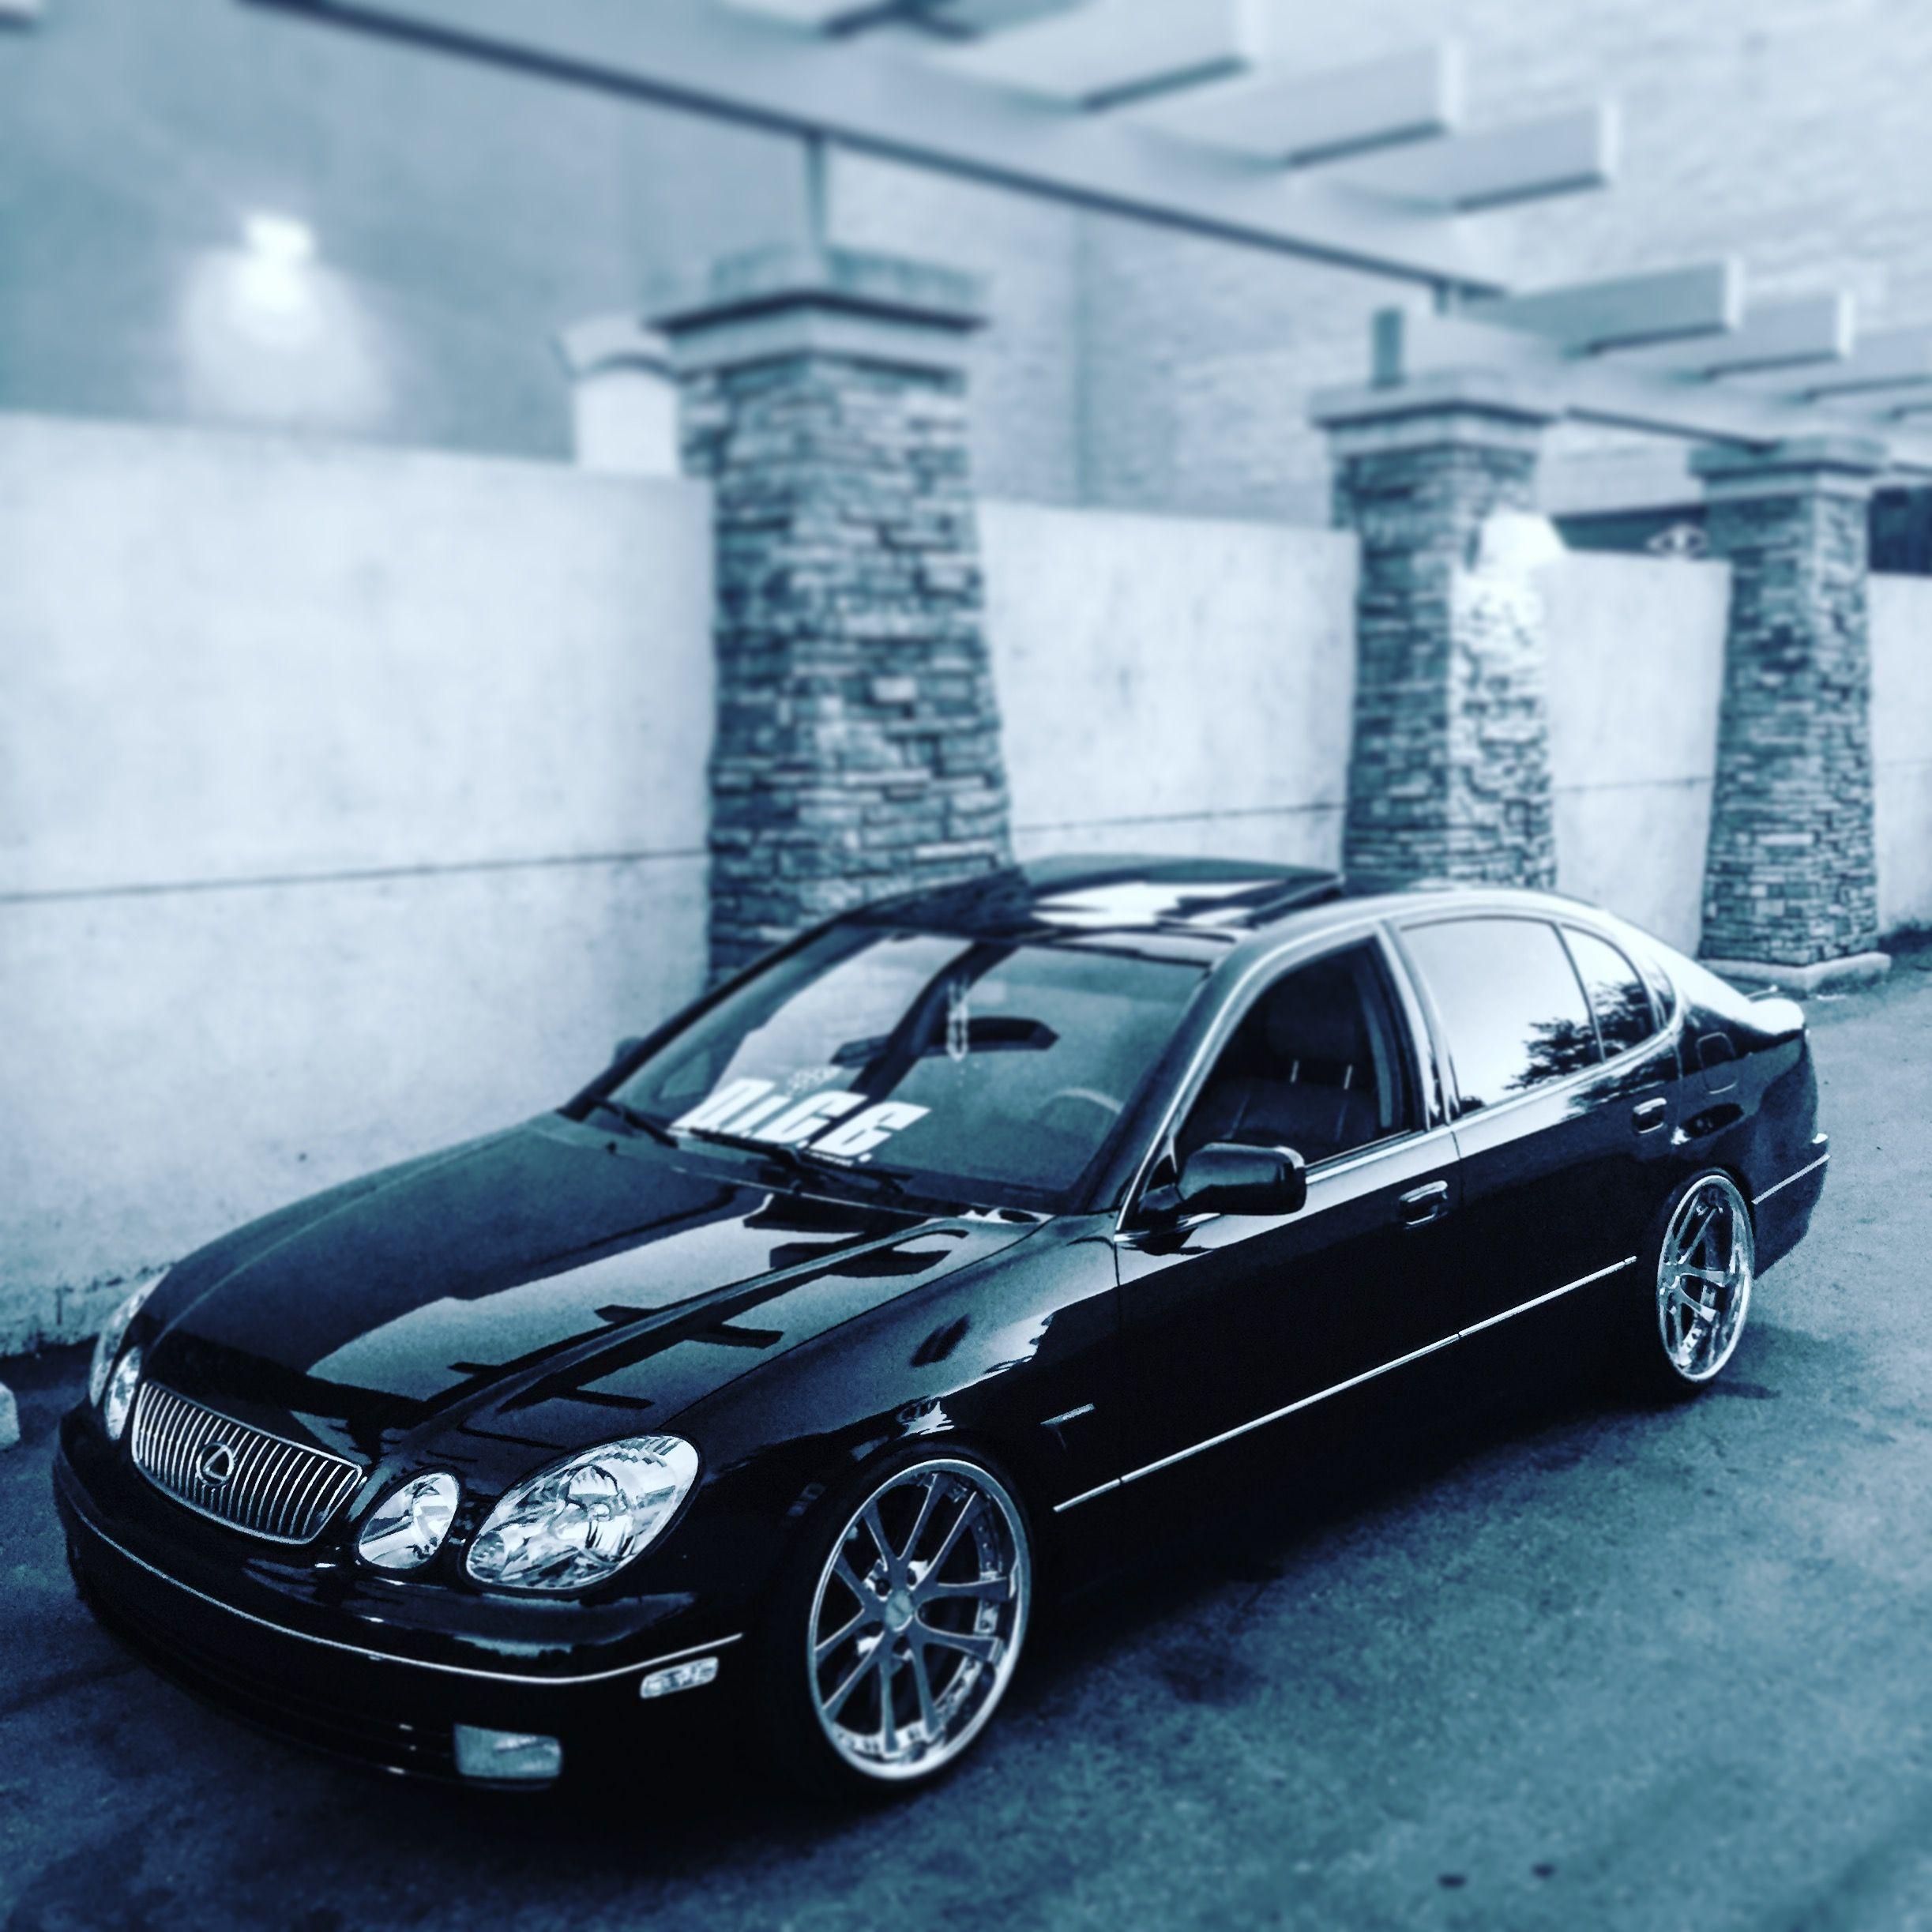 2003 Lexus Gs300 Vip Lexus Gs300 Lexus Cars Lexus Lx470